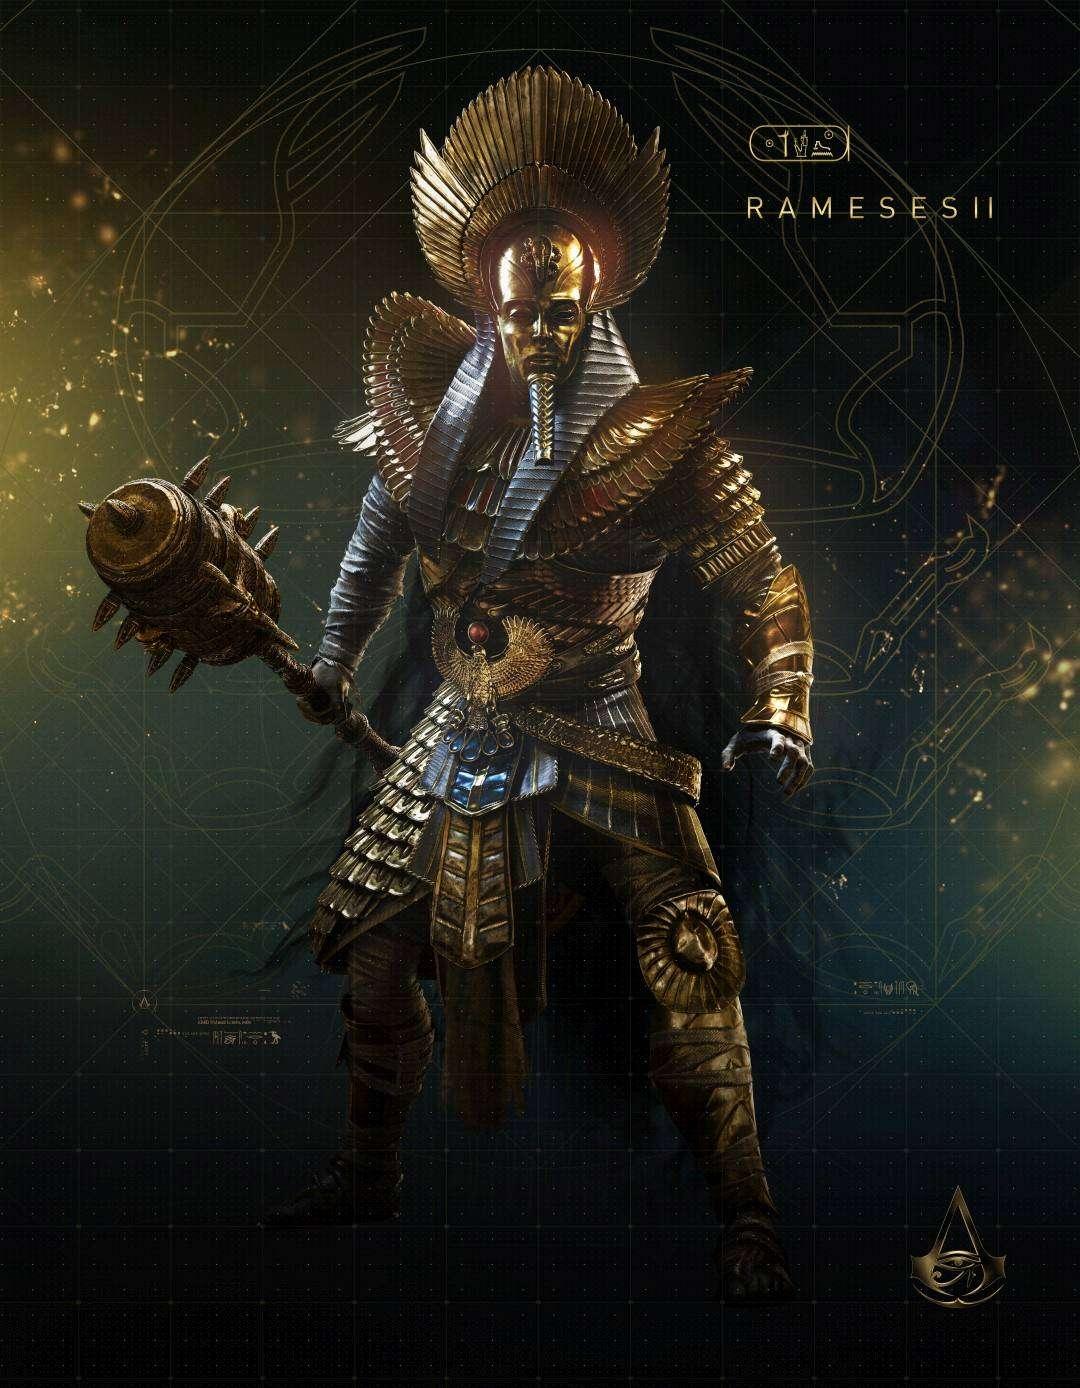 Assassin's Creed Origins, trailer di lancio per The Curse of the Pharaohs